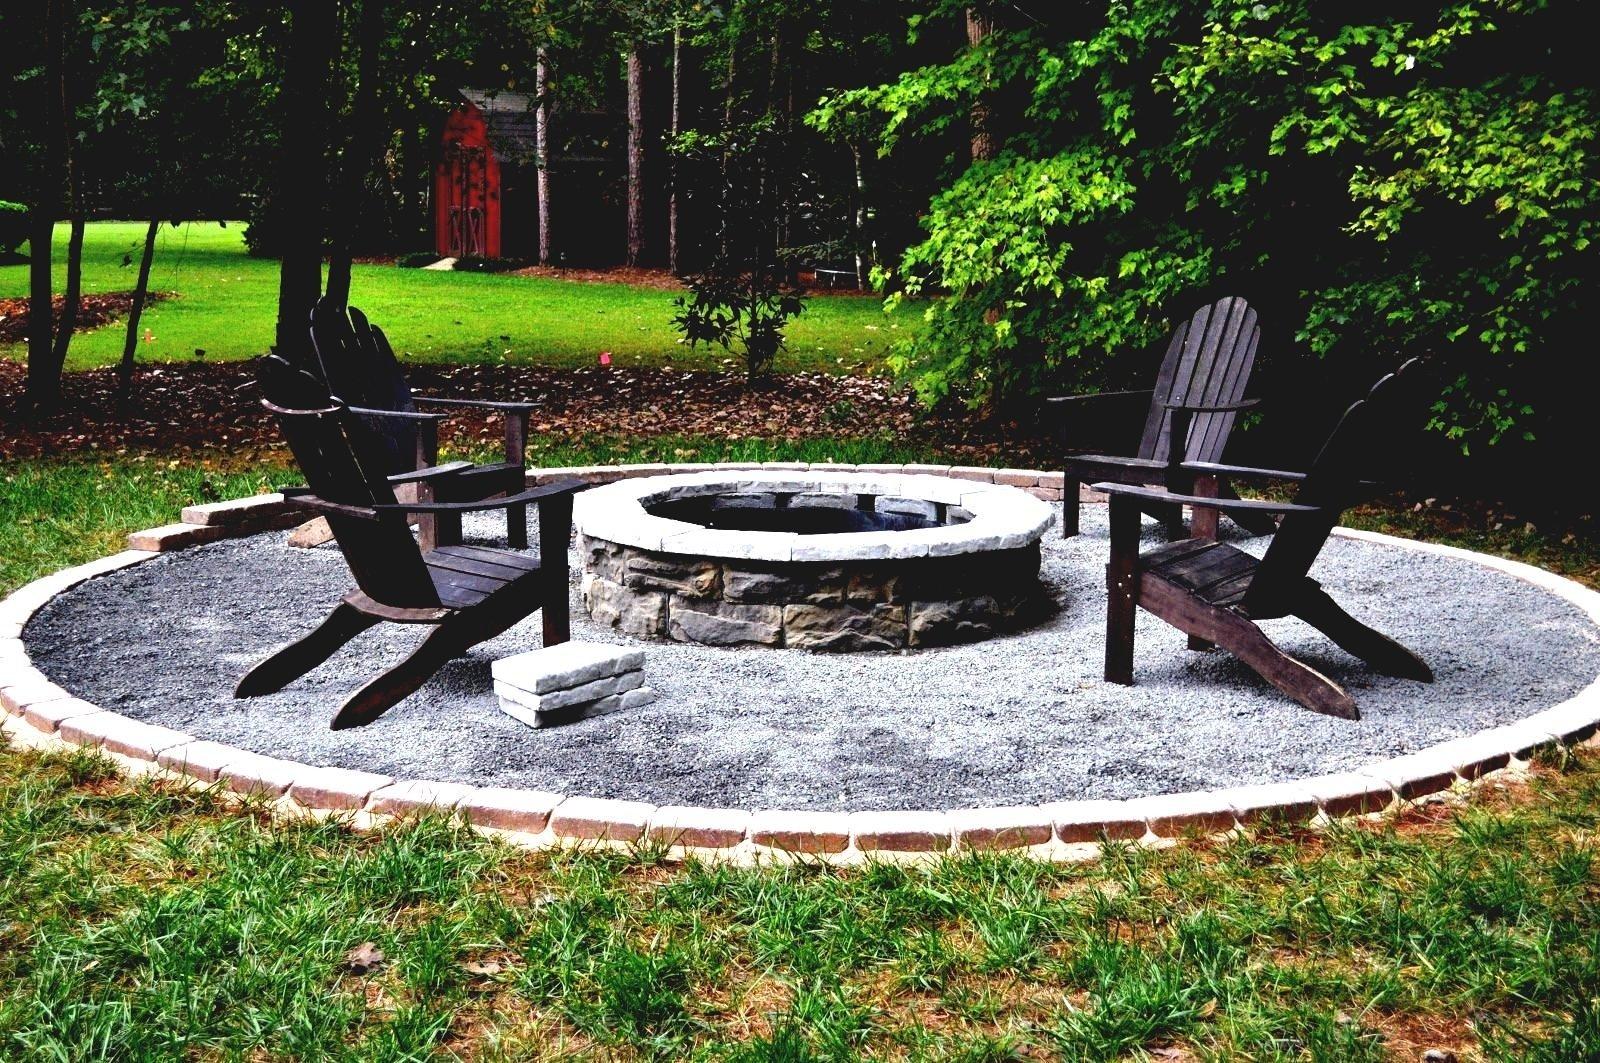 10 Most Popular Cheap Outdoor Fire Pit Ideas cheap outdoor fire pit ideas in ground and aboveground handbagzone 2021